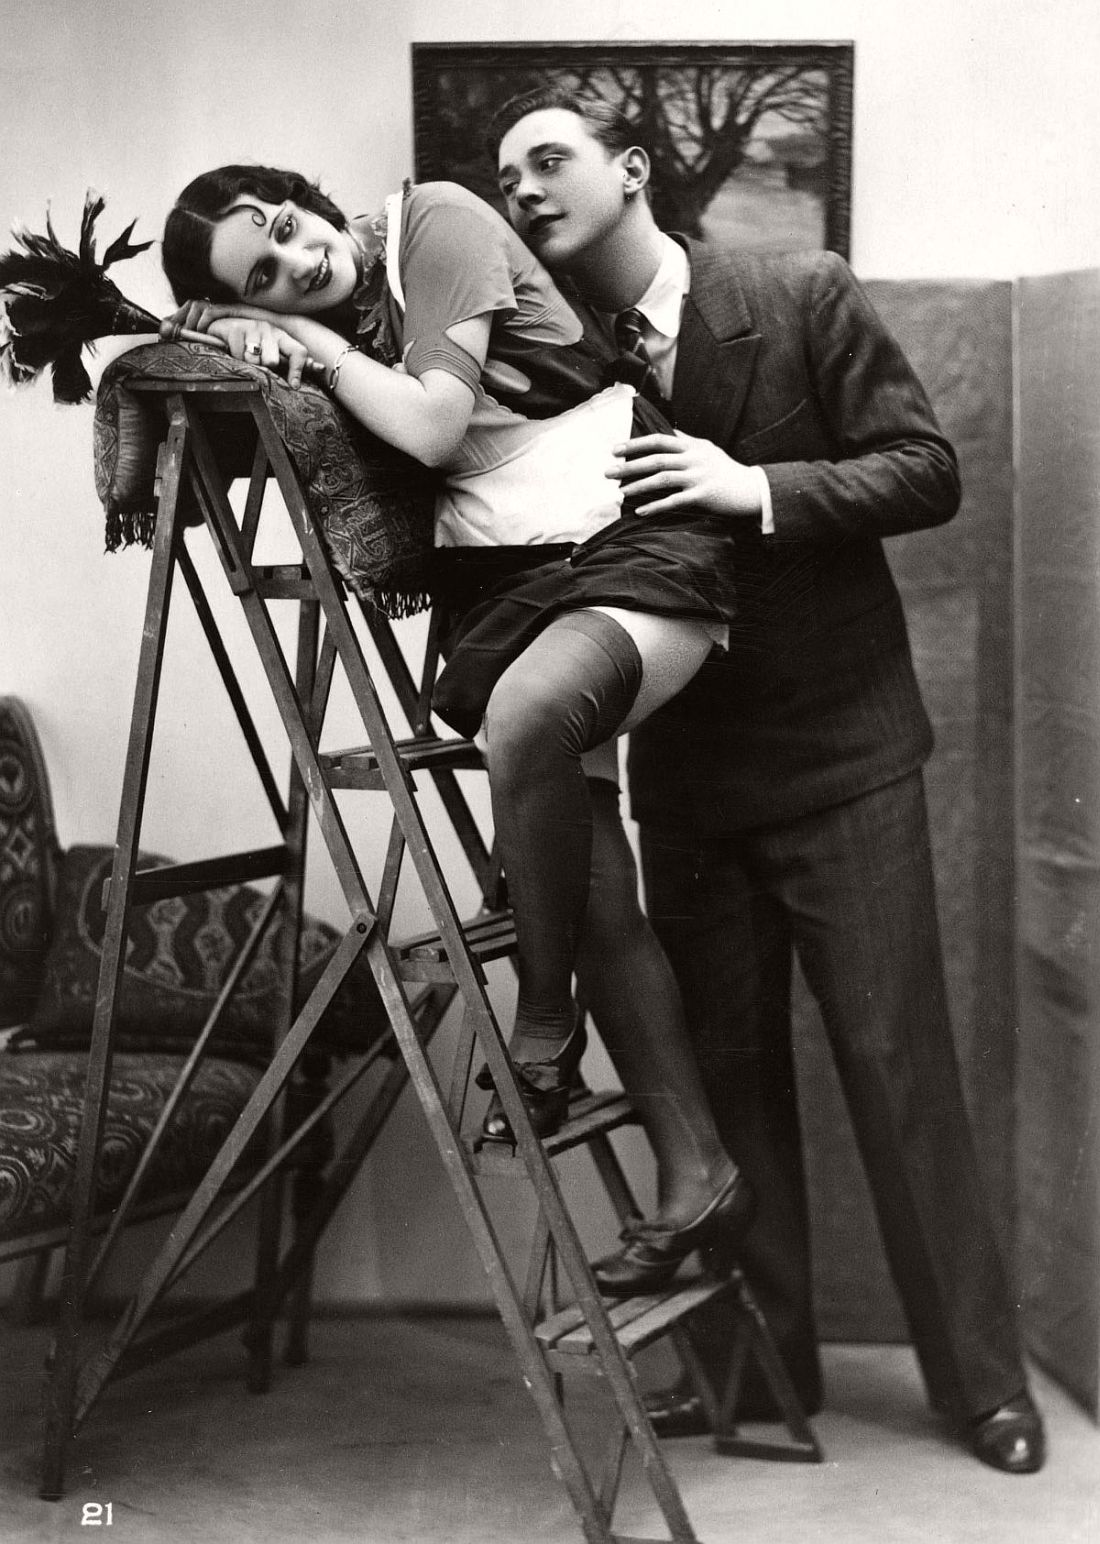 vintage erotic photo naked women